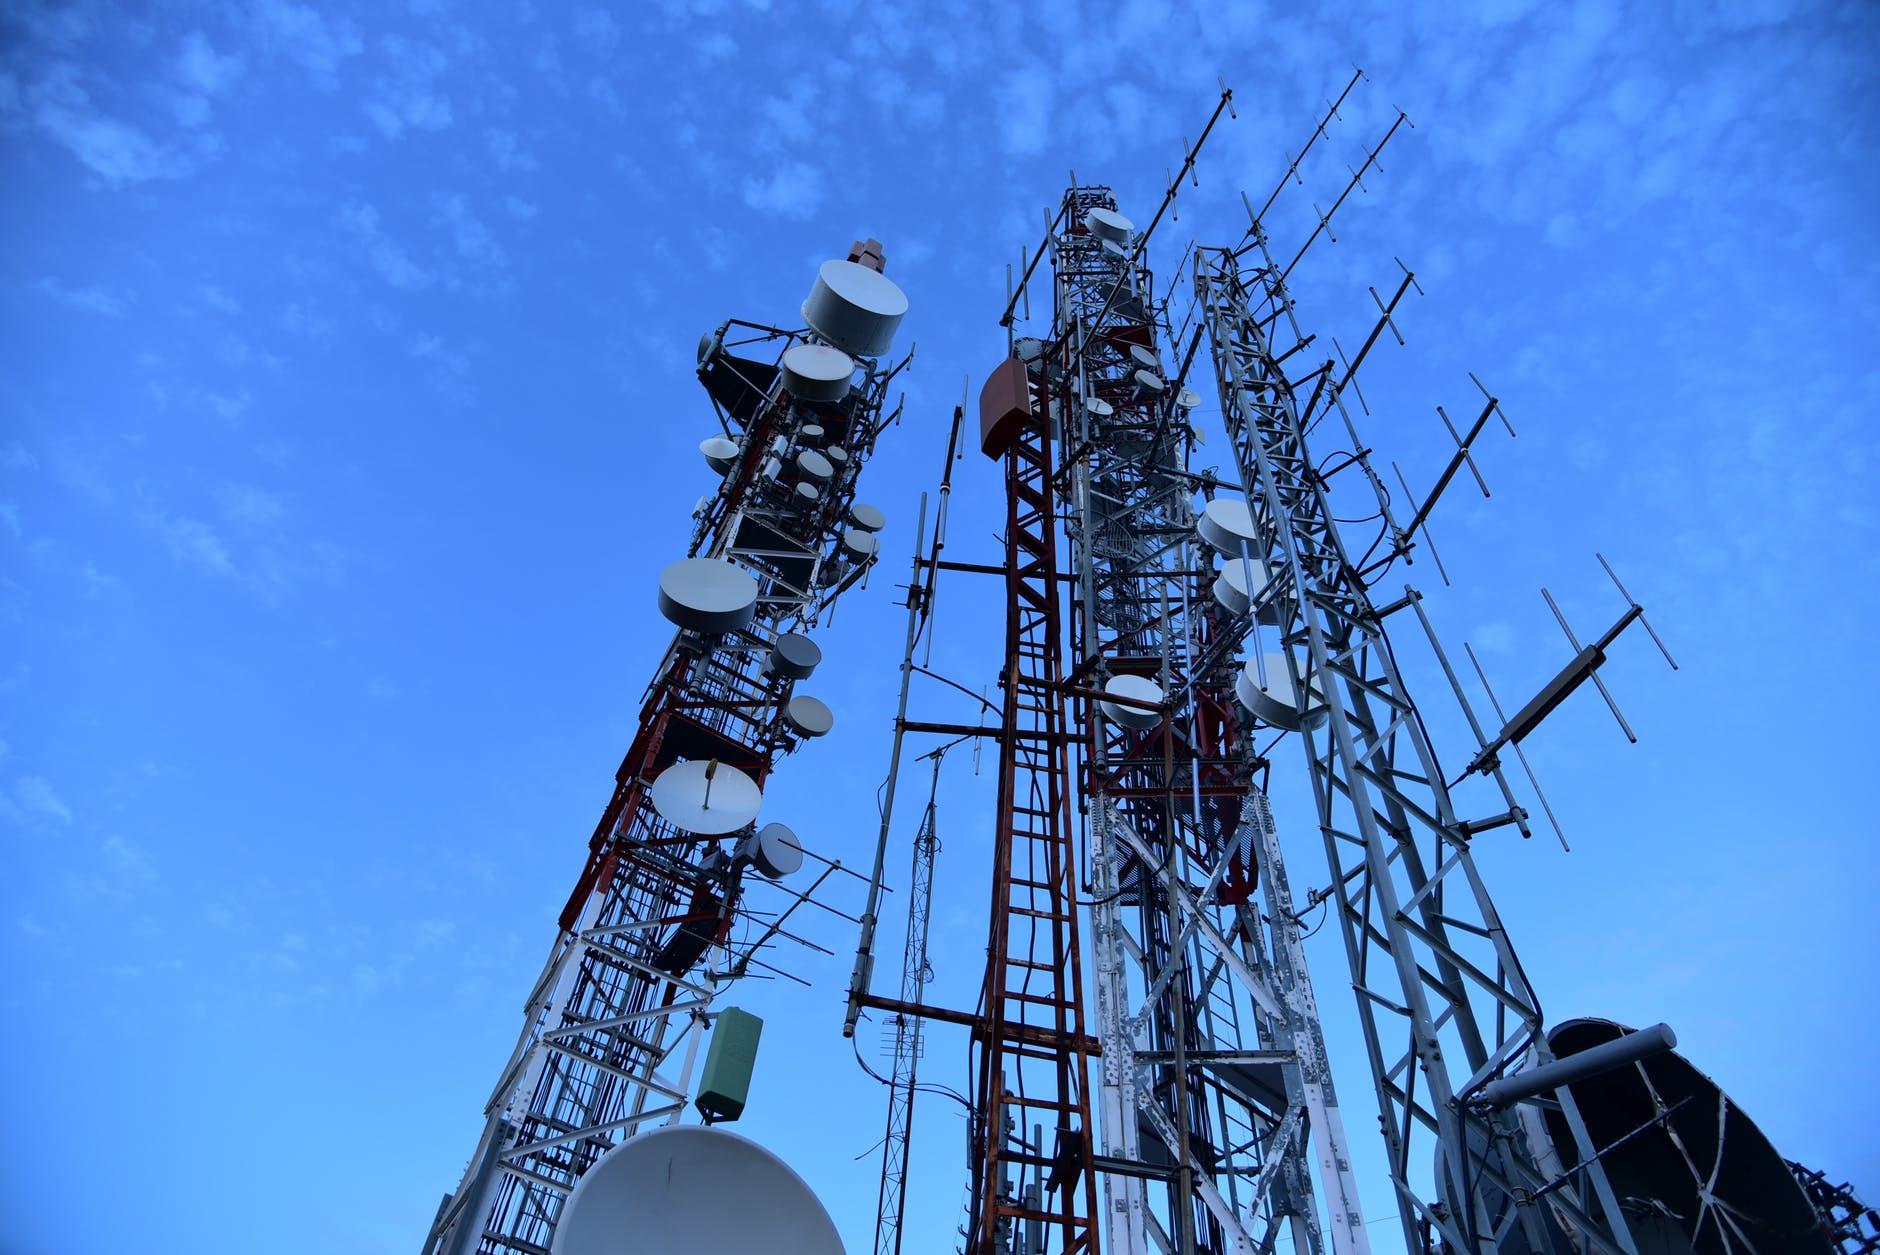 Telecoms giant BT considers regional hub in Birmingham